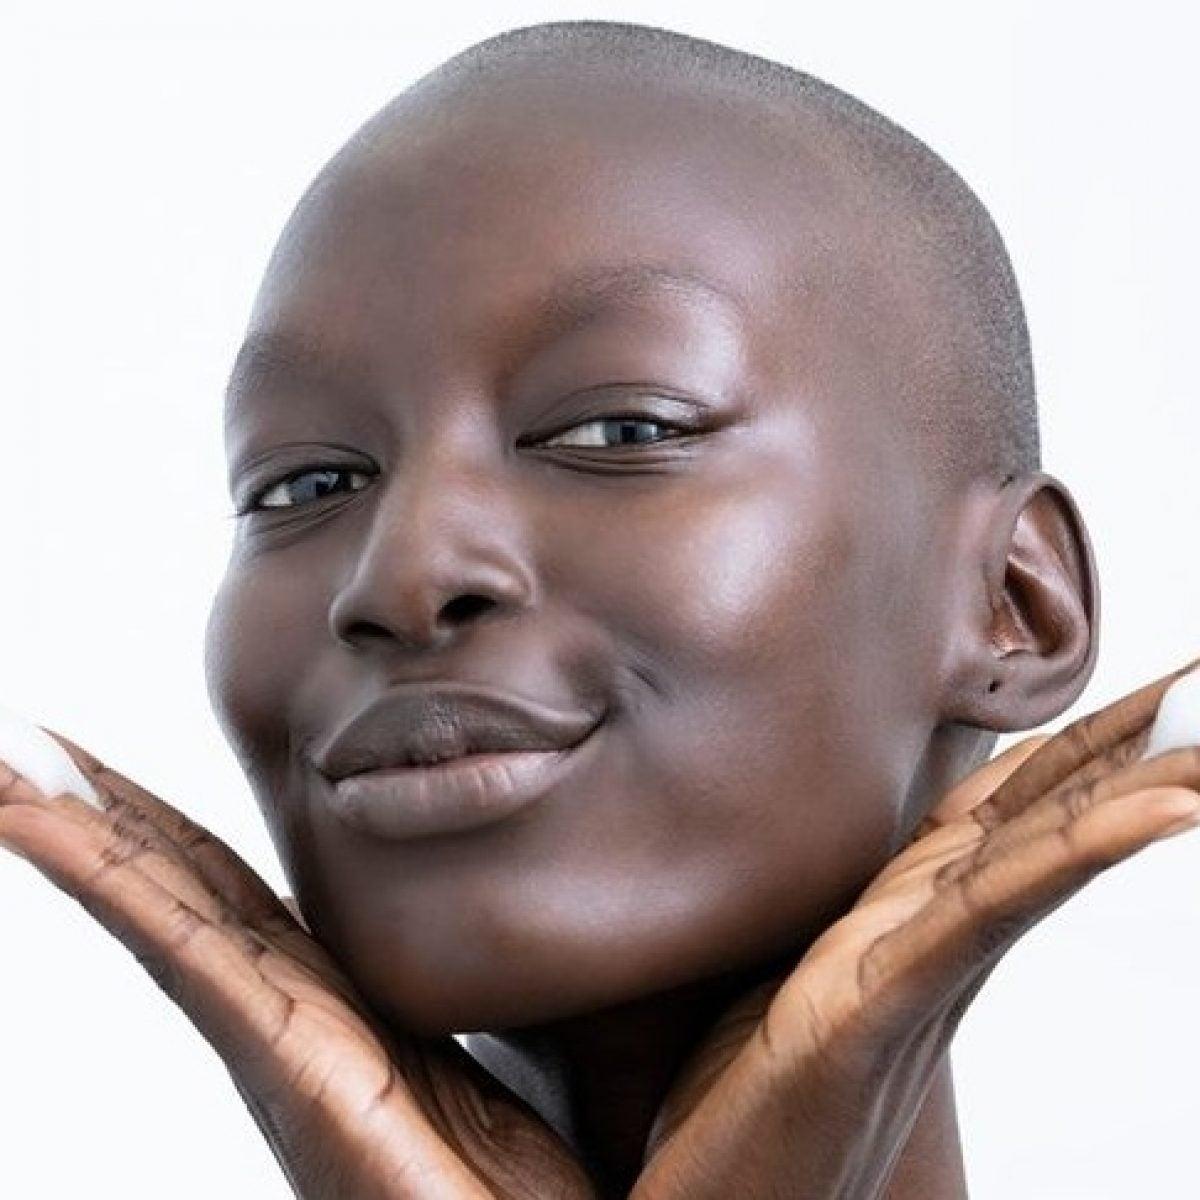 Natacha Paugum Launches A Melanin-Rich Skincare Brand Using Beauty Secrets From The Motherland